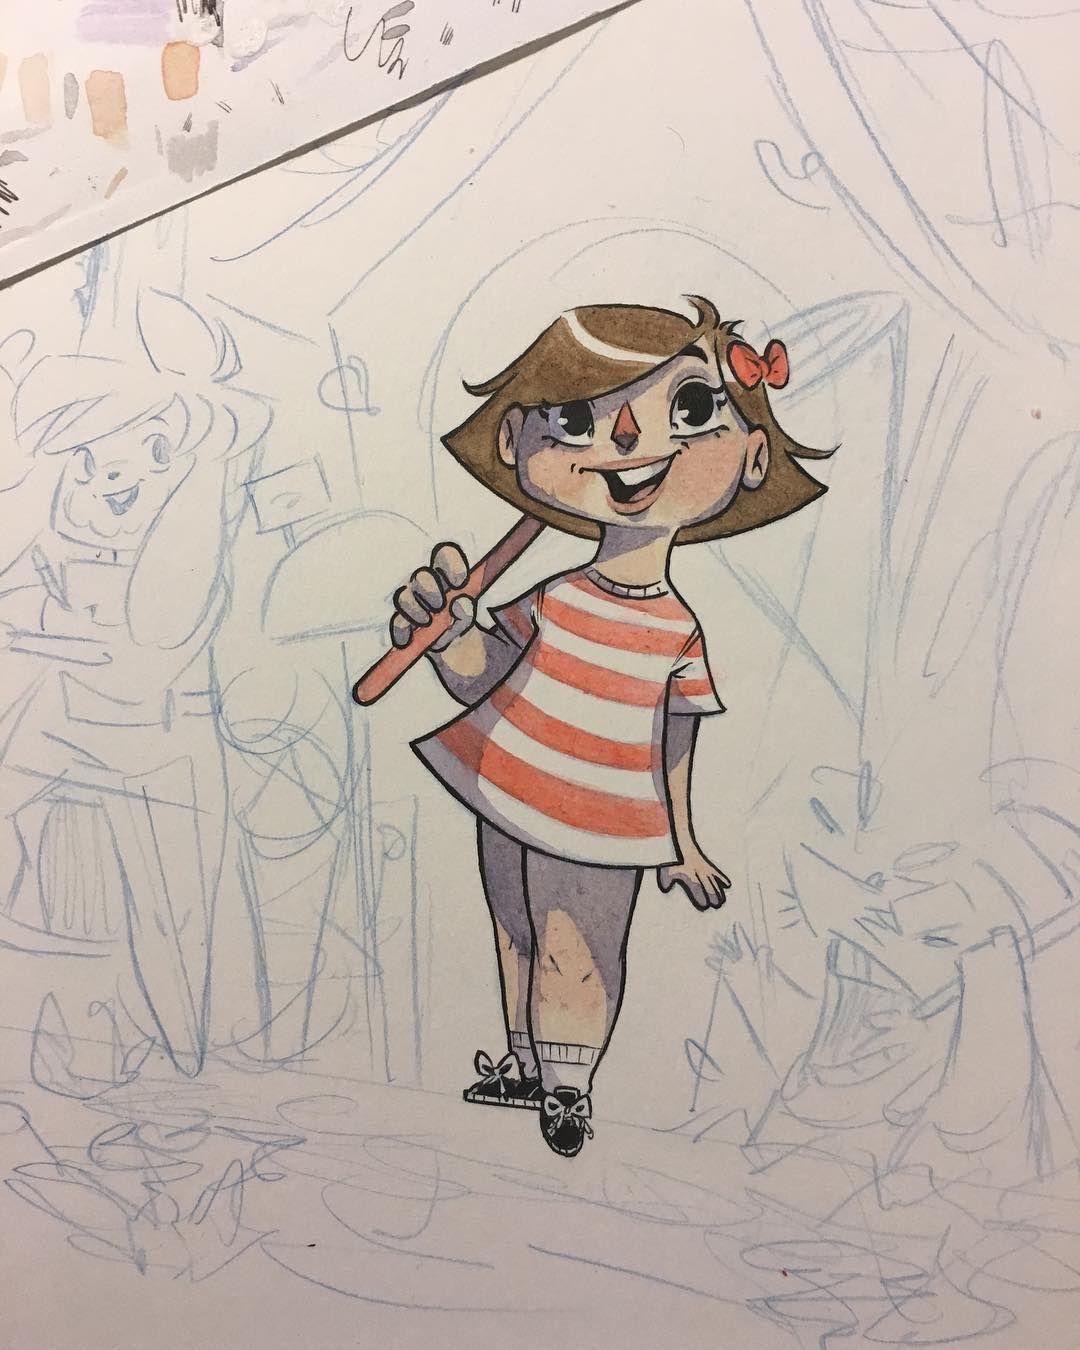 Little villager #animalcrossing #watercolor #sweeneyboo #art #nintento #sketchs #doodle